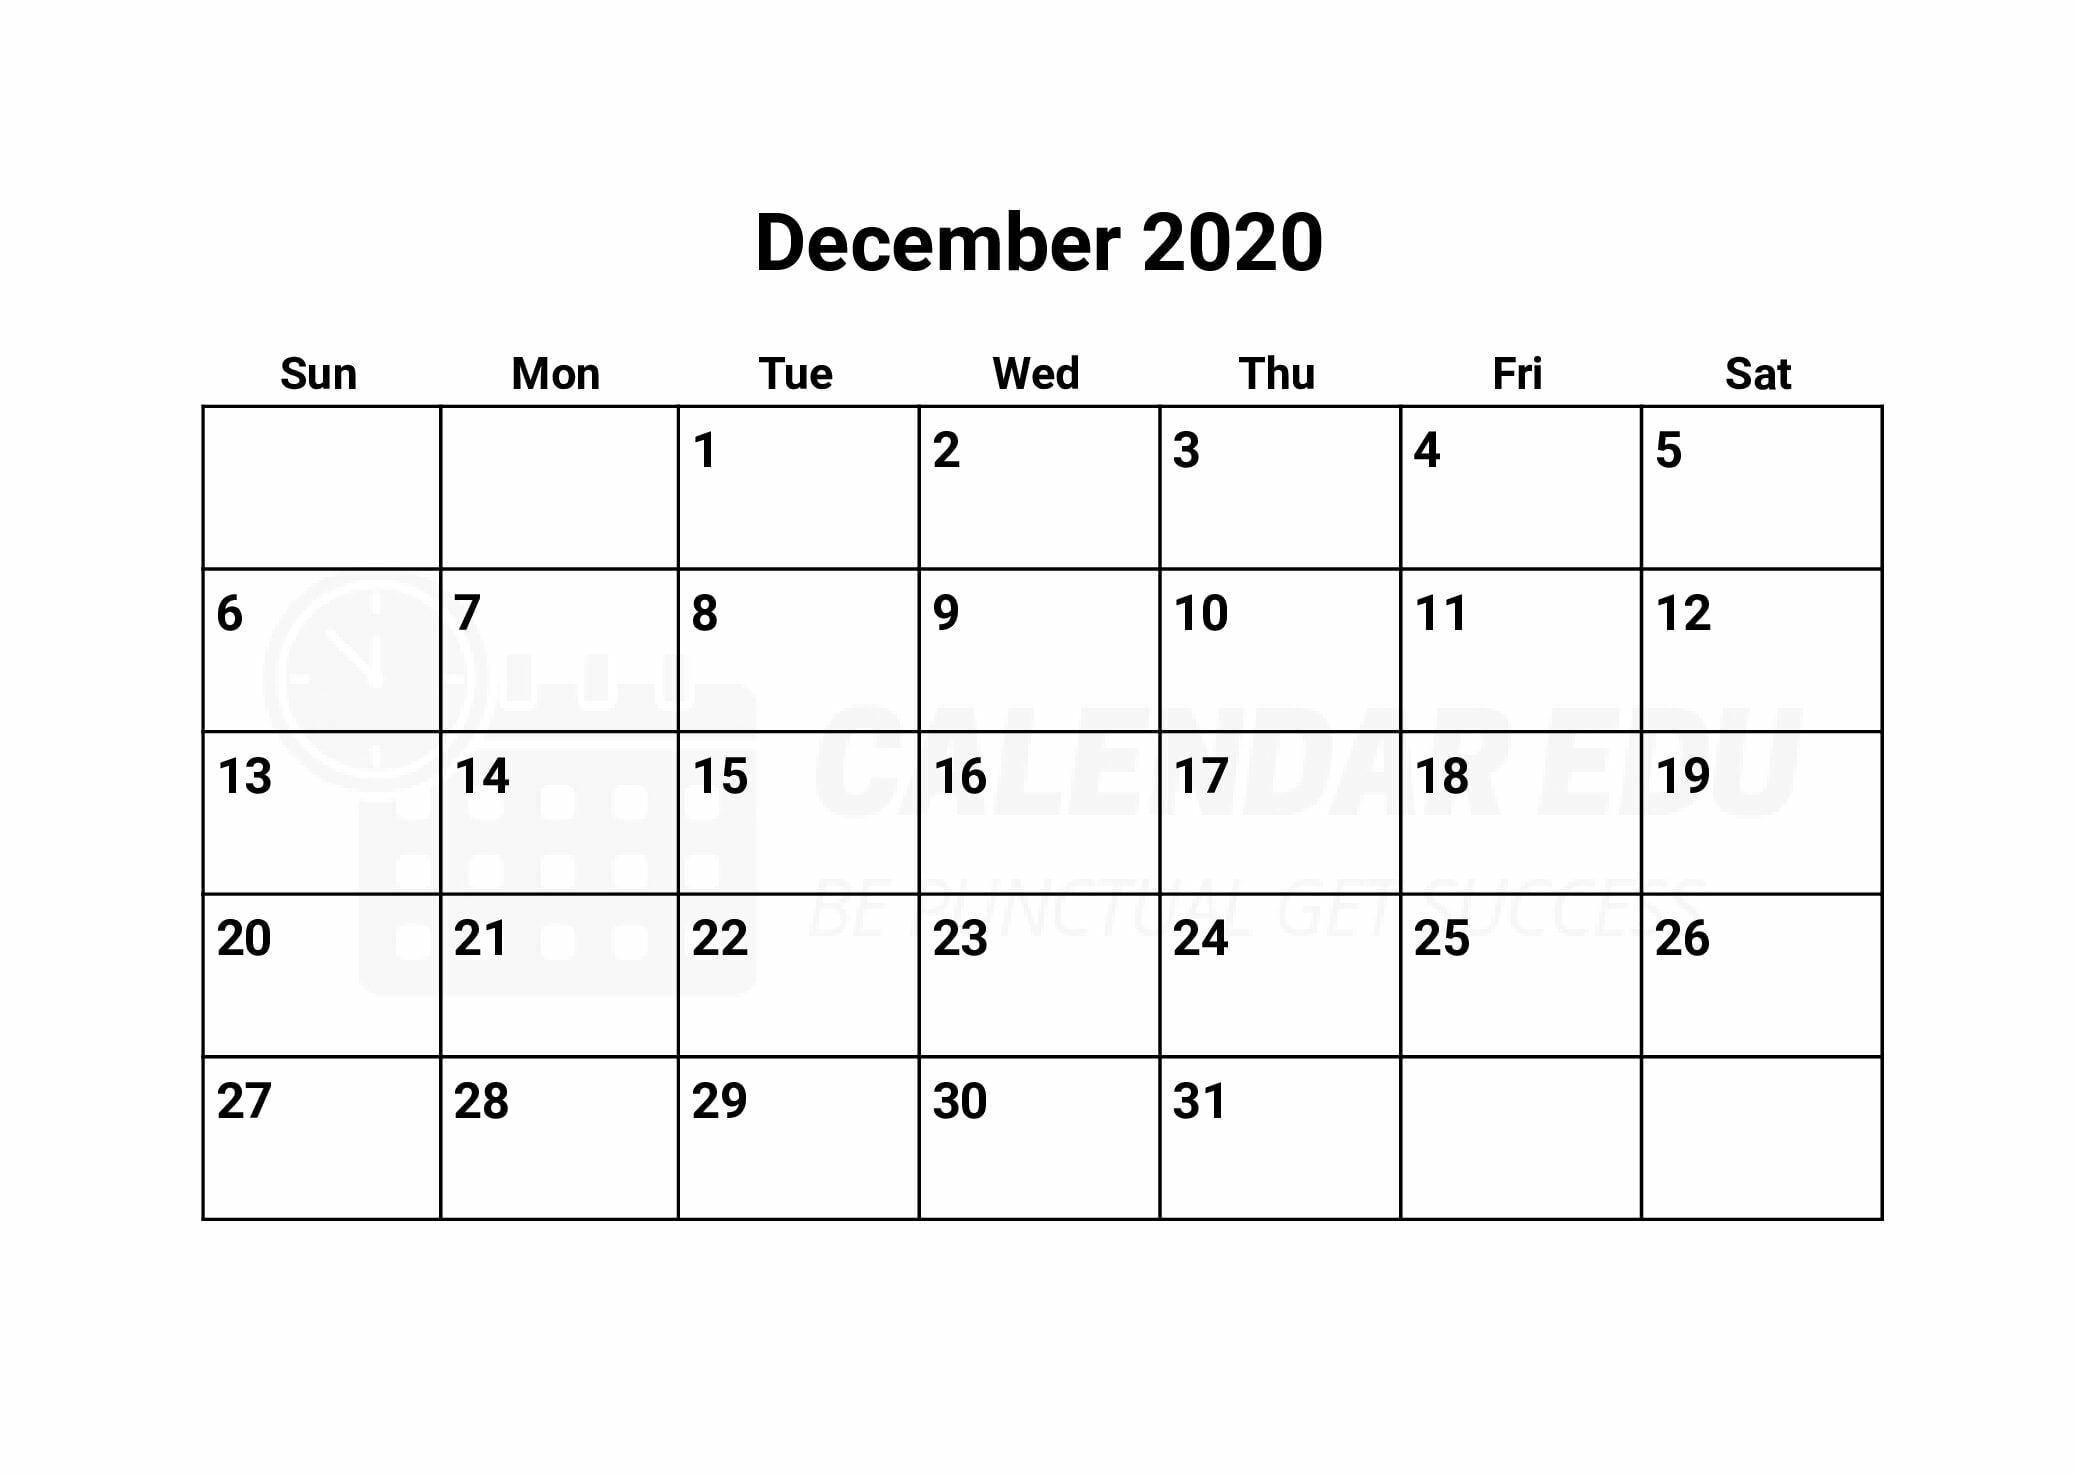 December 2020 calendar printable templates for Free